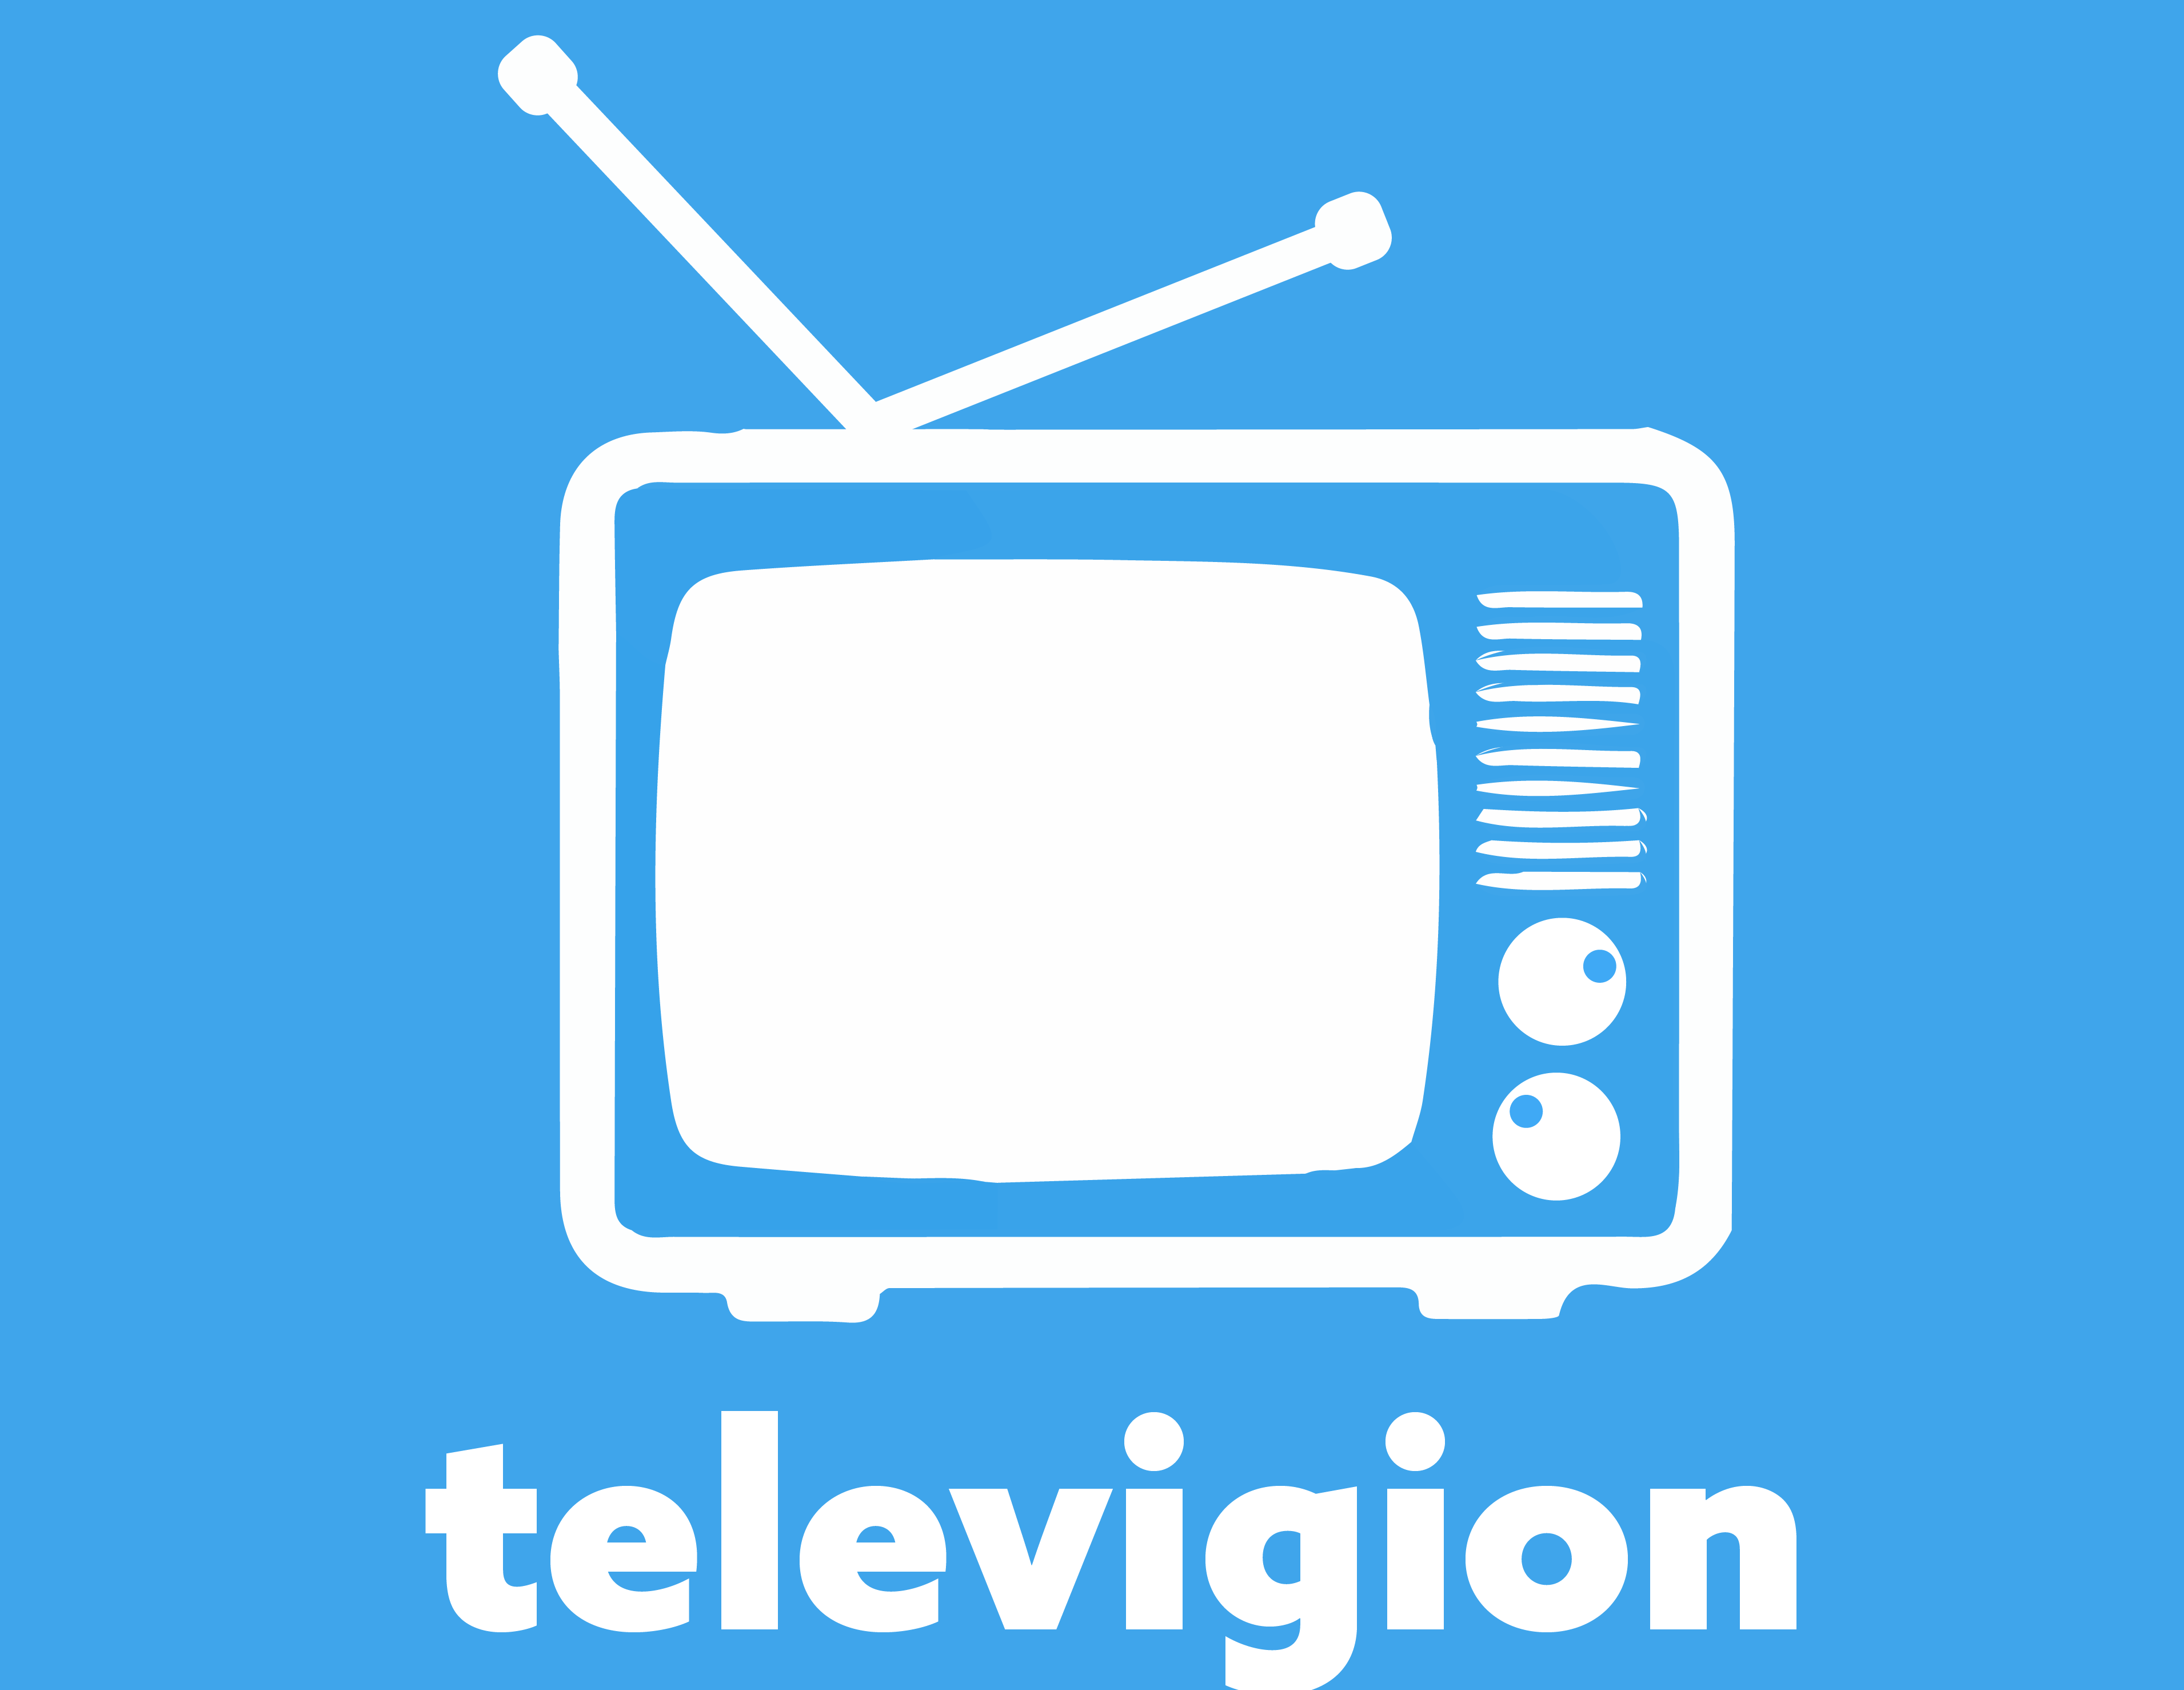 Televigion